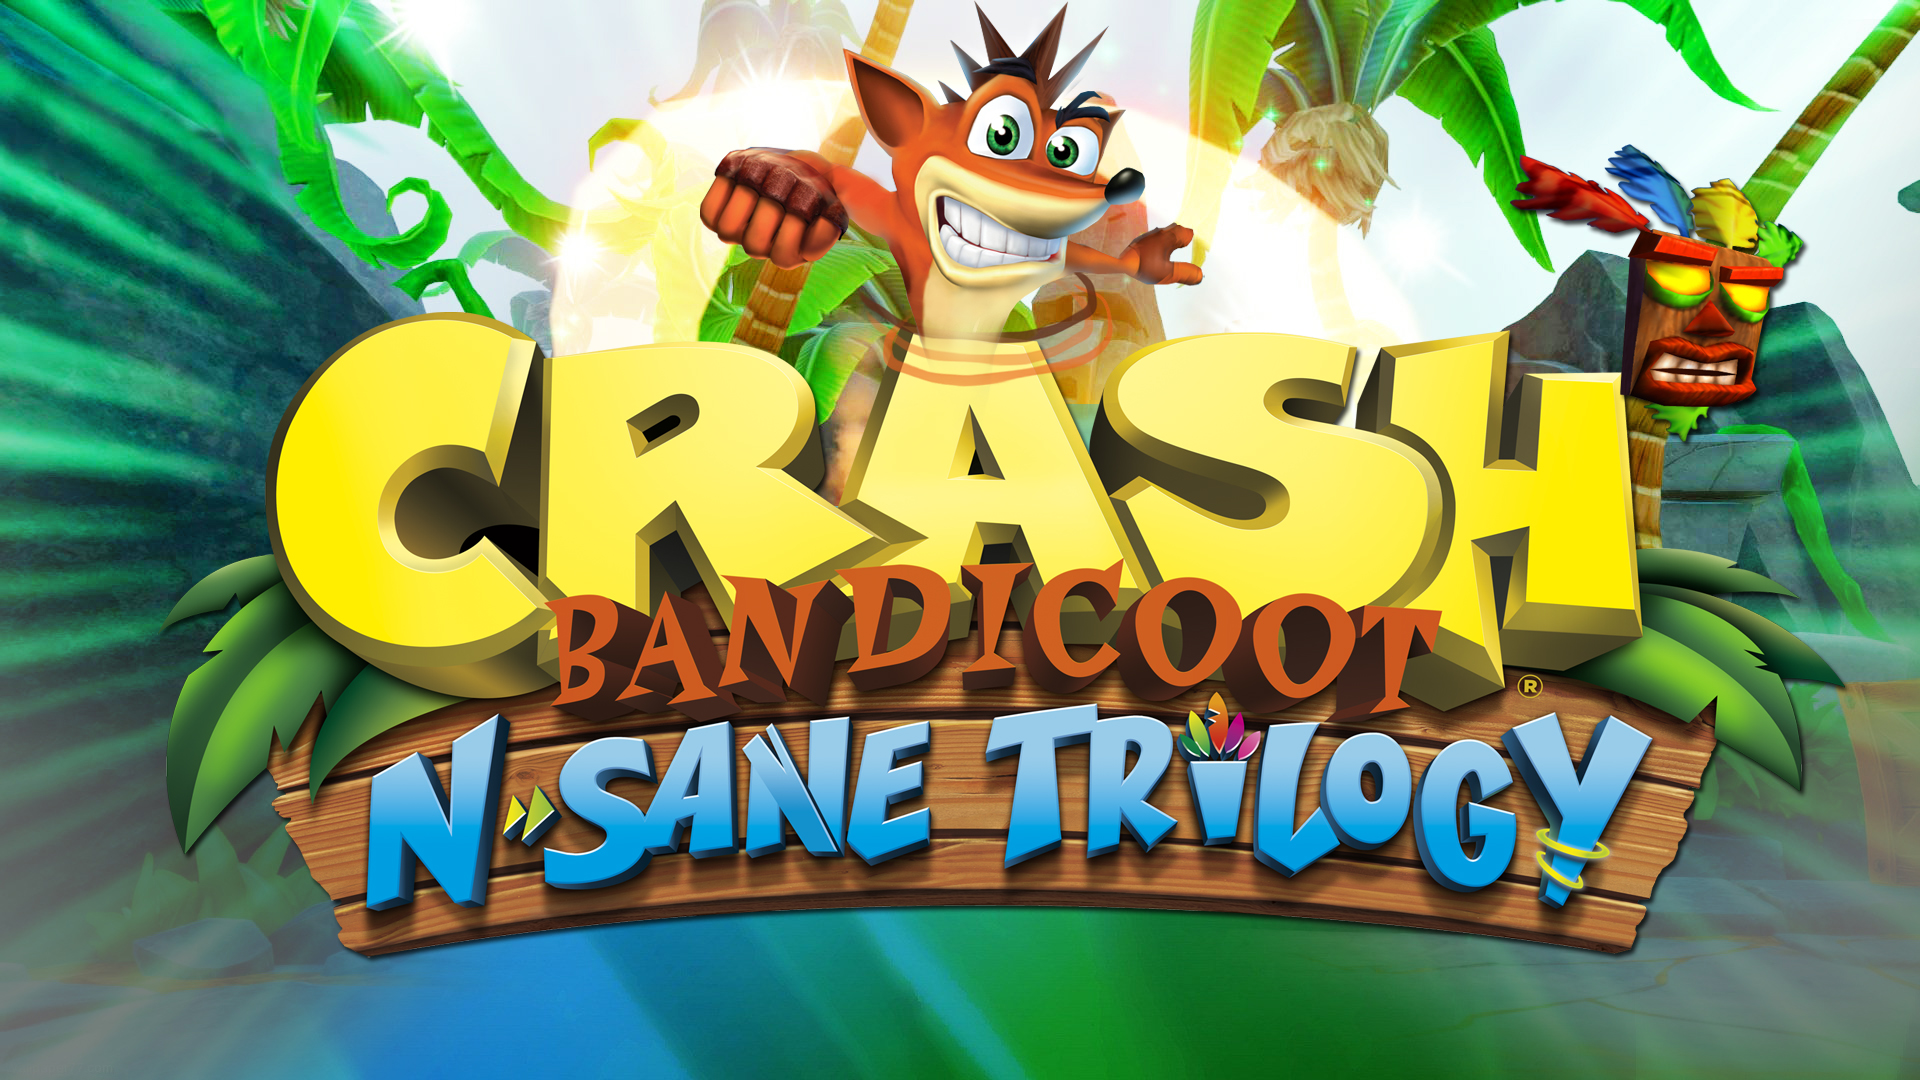 crash bandicoot n sane trilogy best selling physical game globally